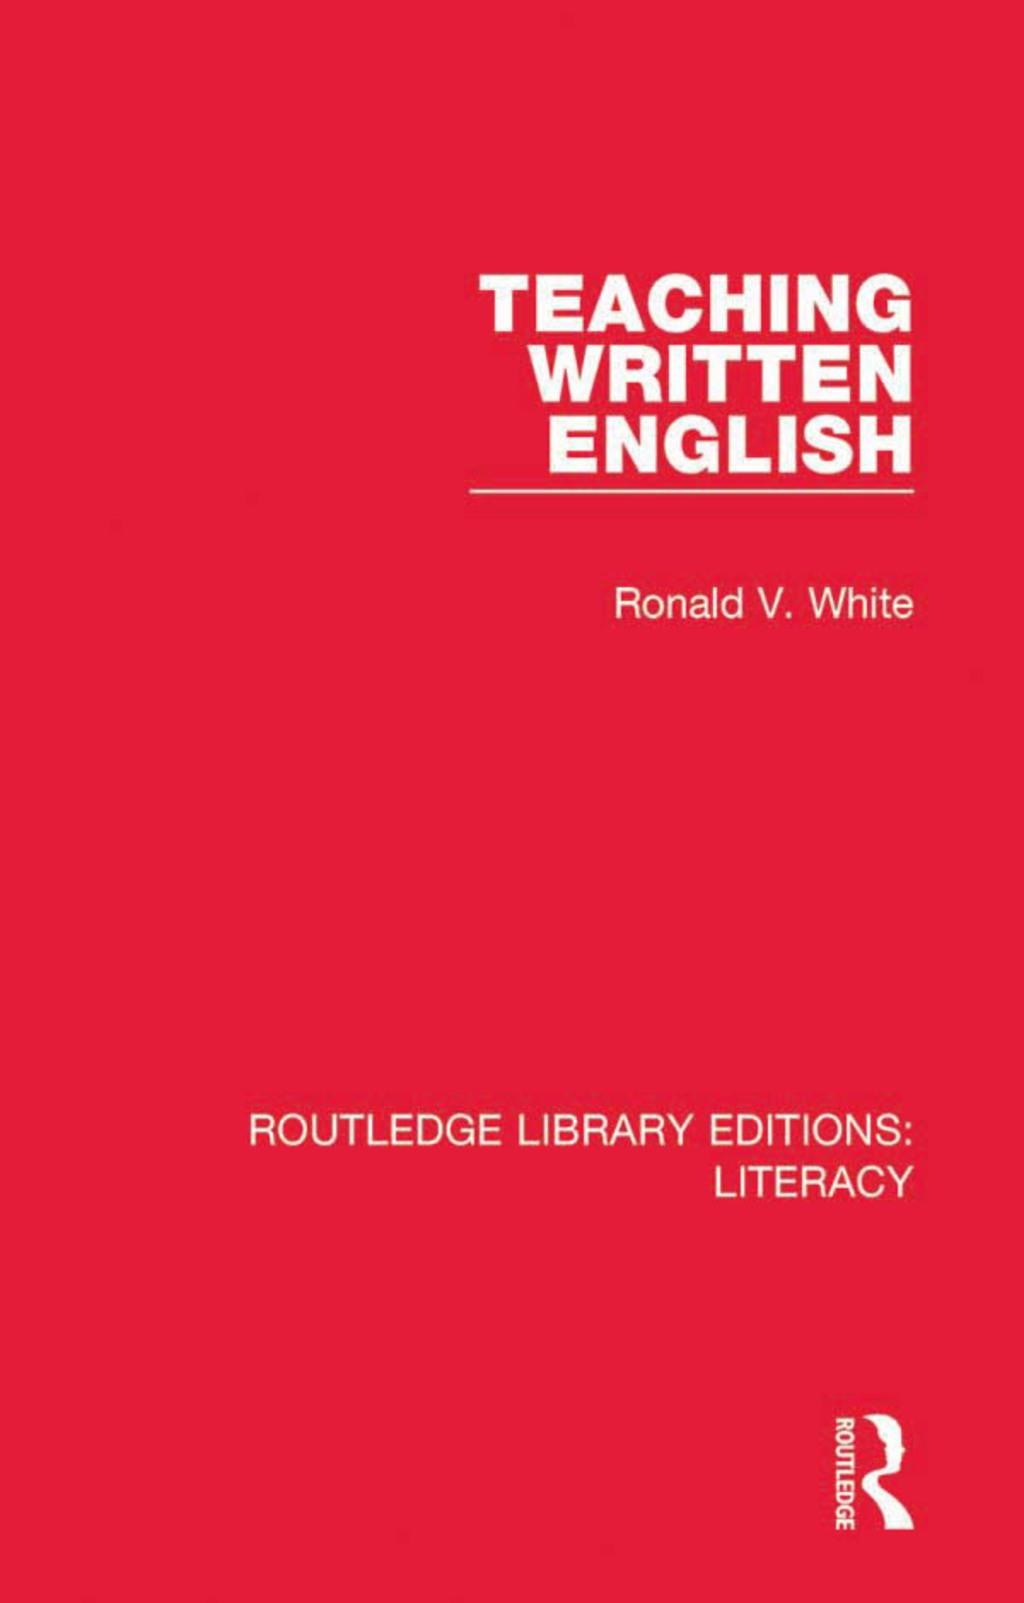 Teaching Written English (eBook Rental)